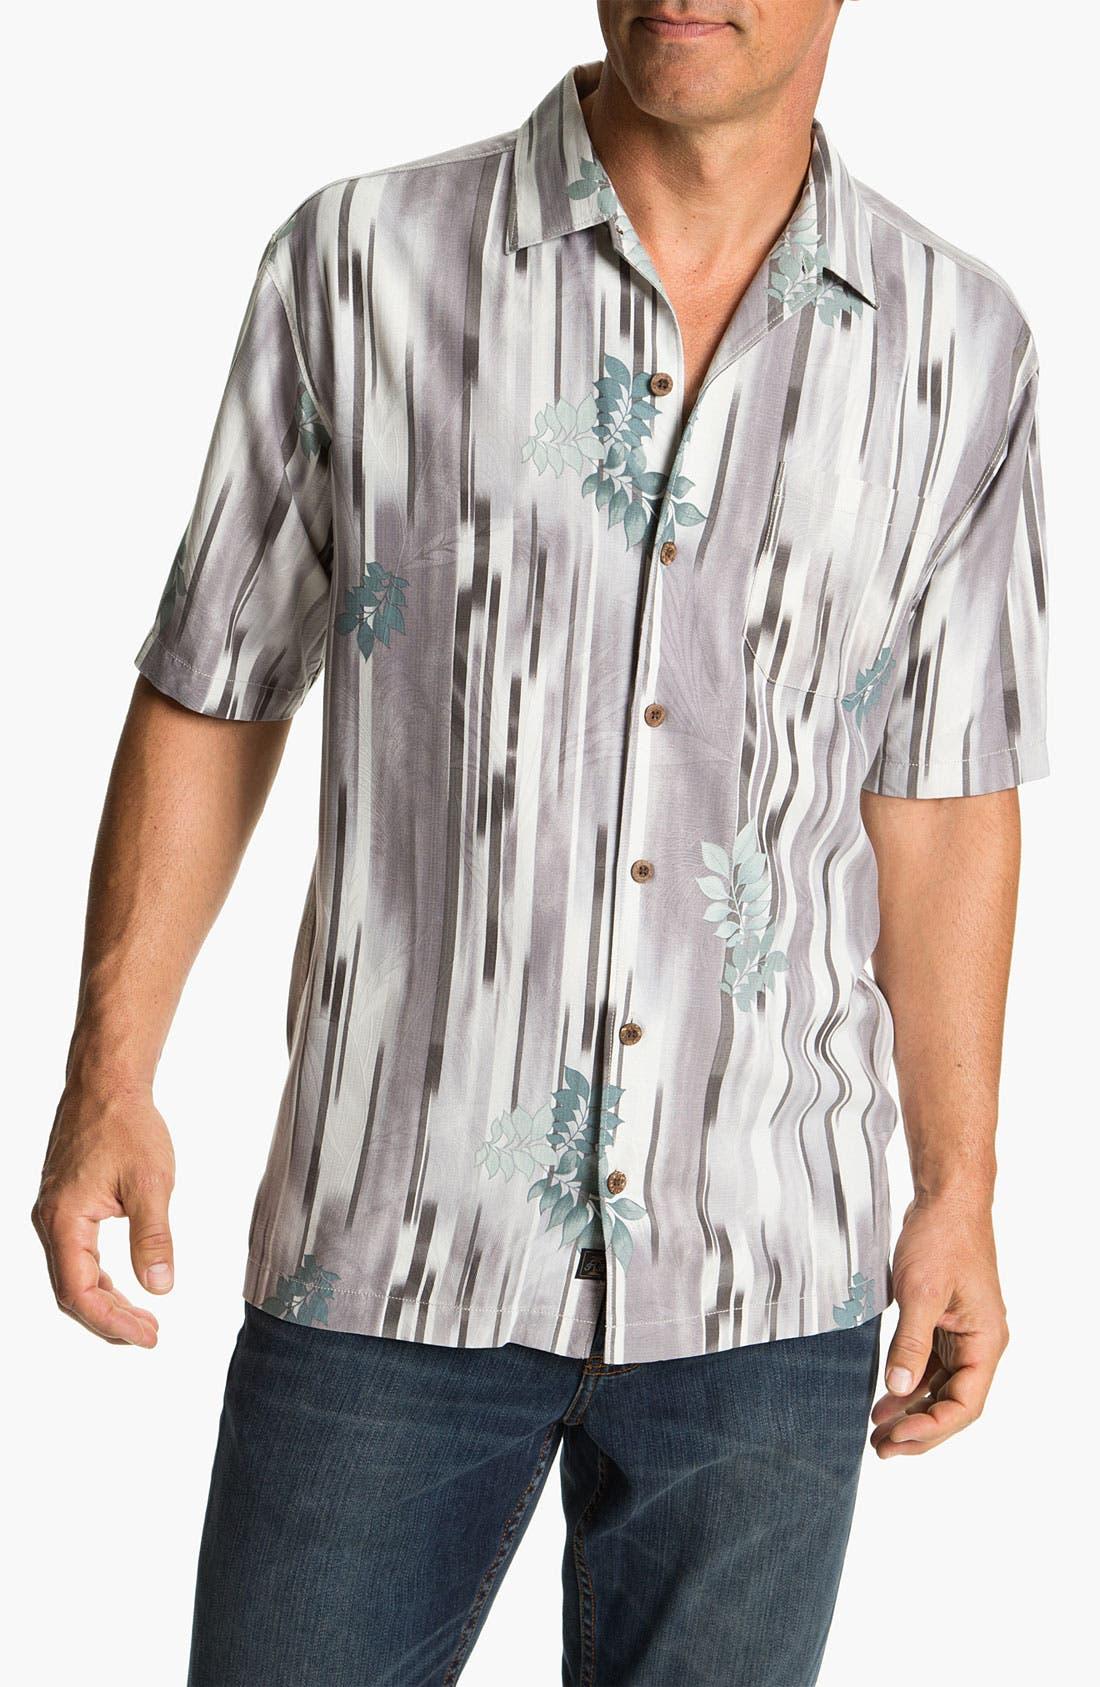 Main Image - Tommy Bahama 'Lemongrass Ikat' Silk Campshirt